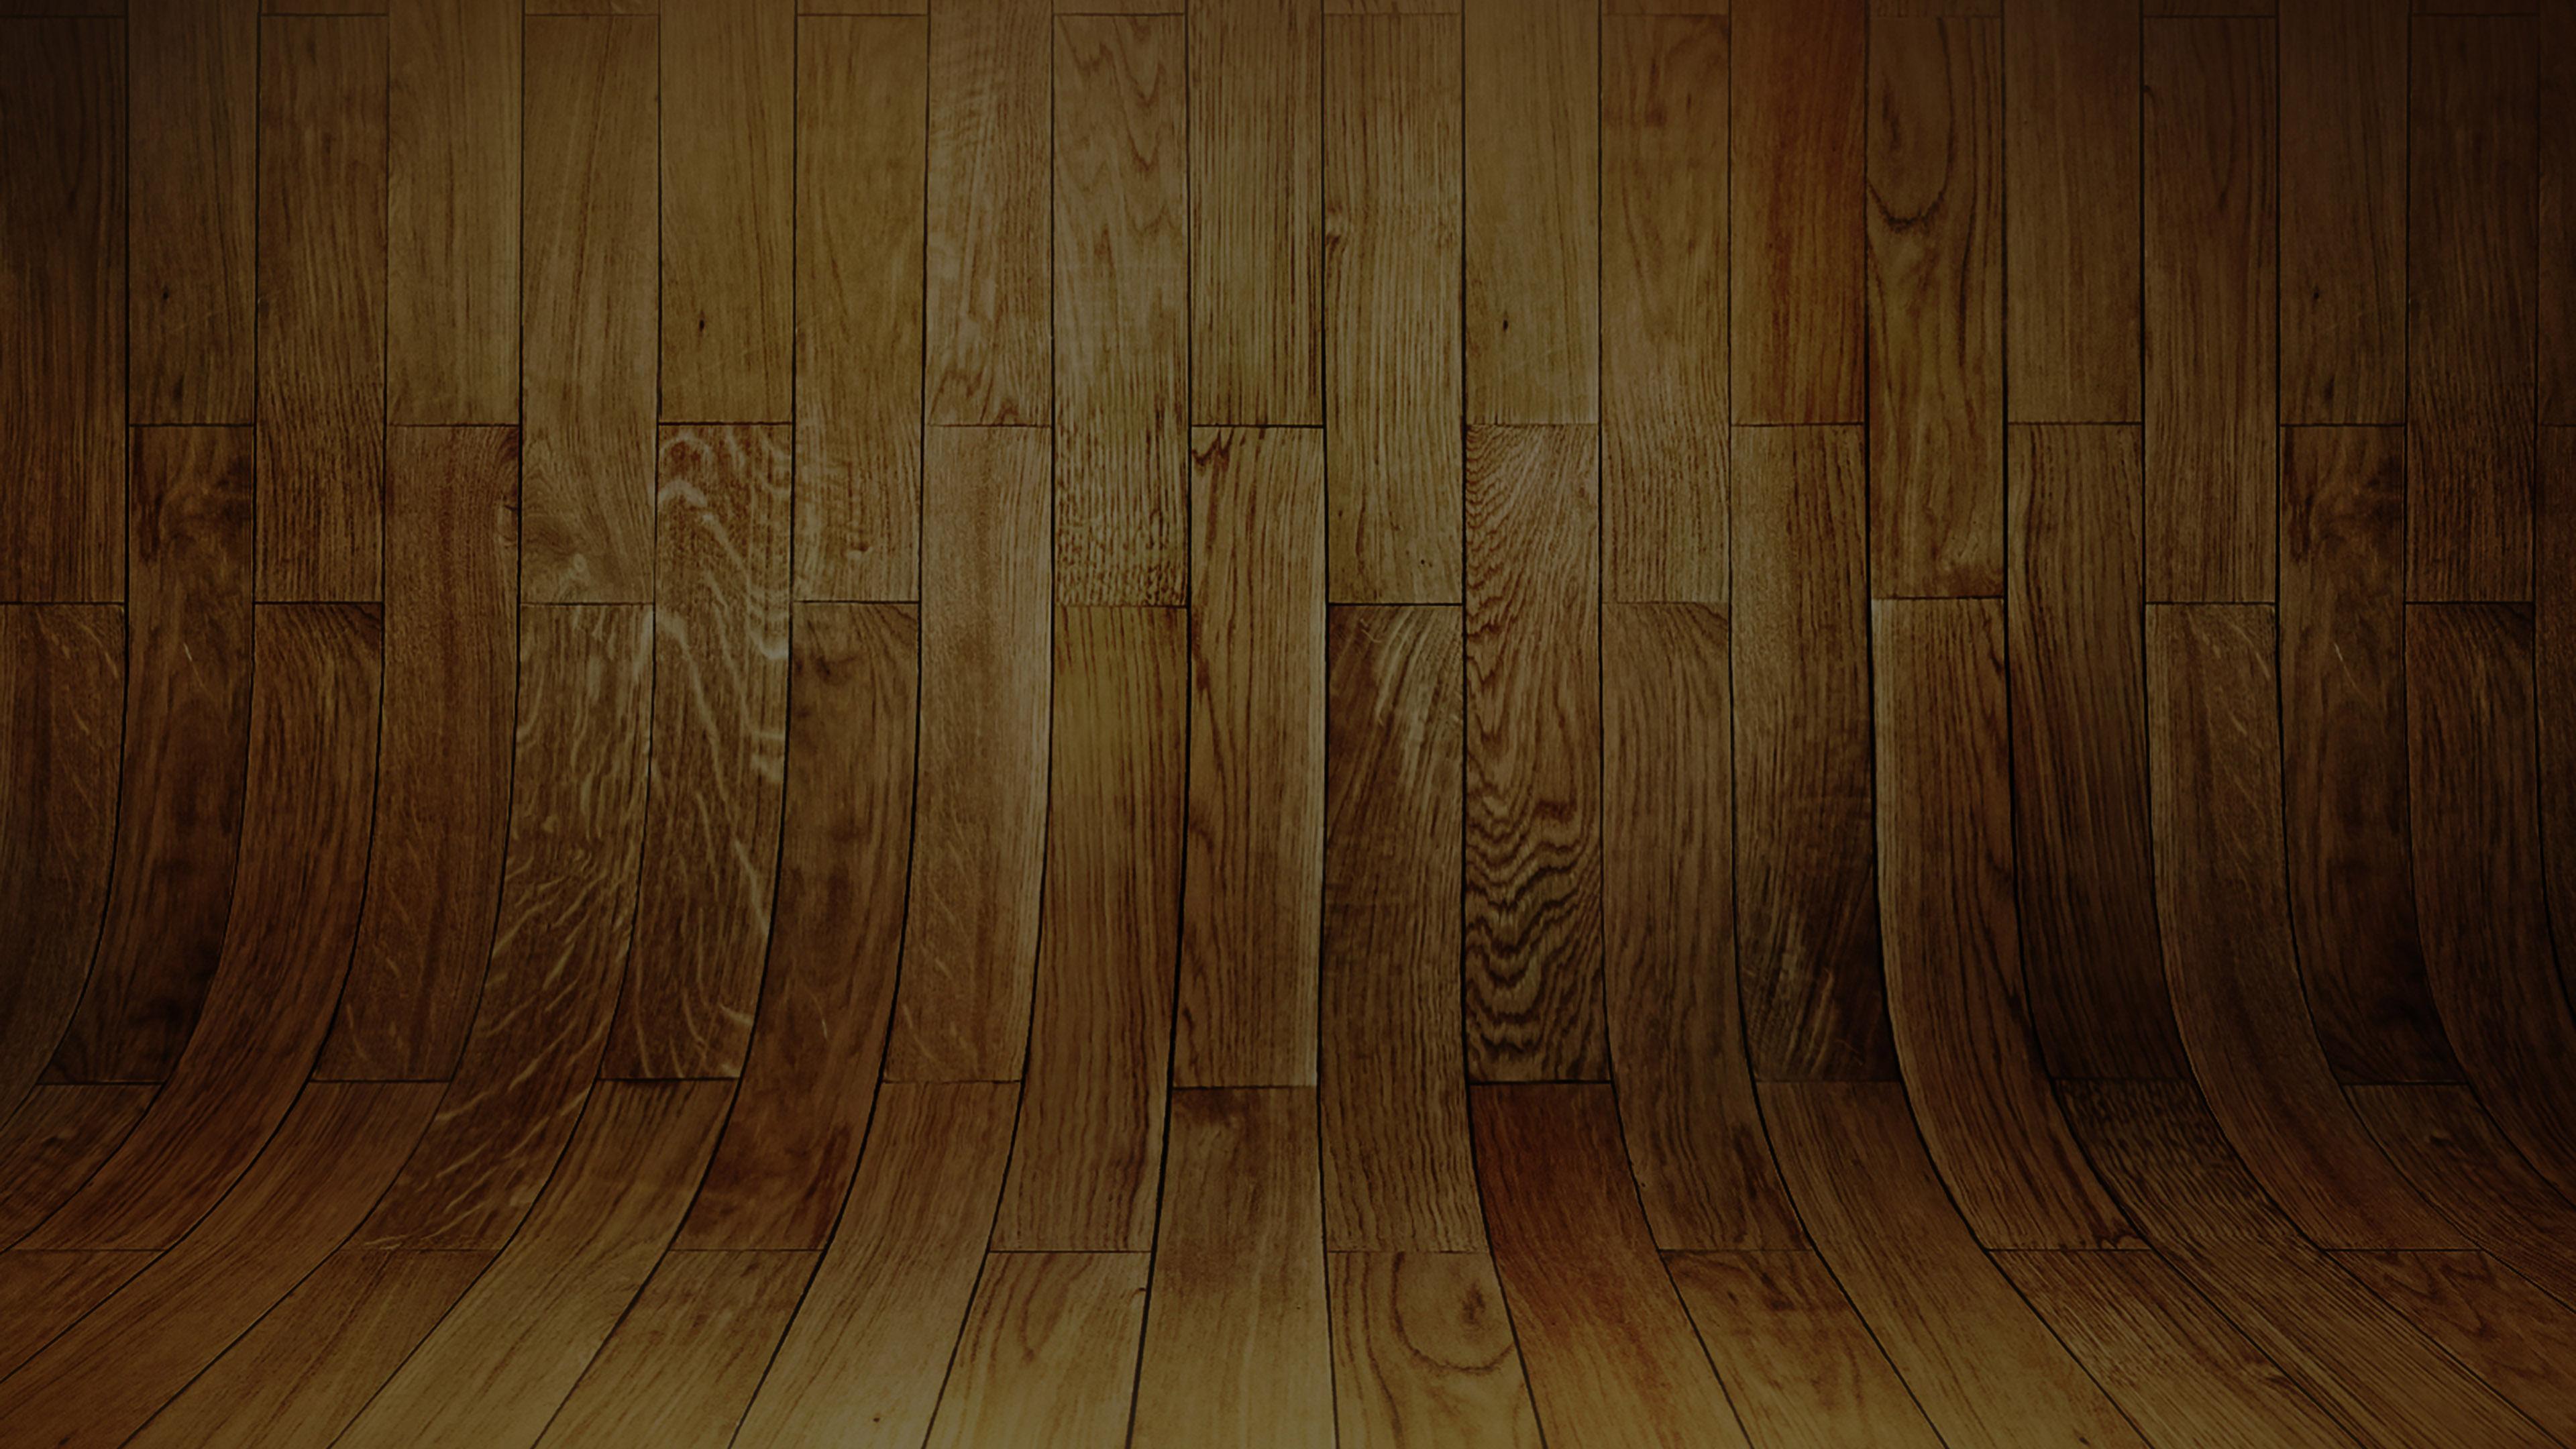 Desktoppapers Co Vf59 Wood Texture Nature Dark Pattern